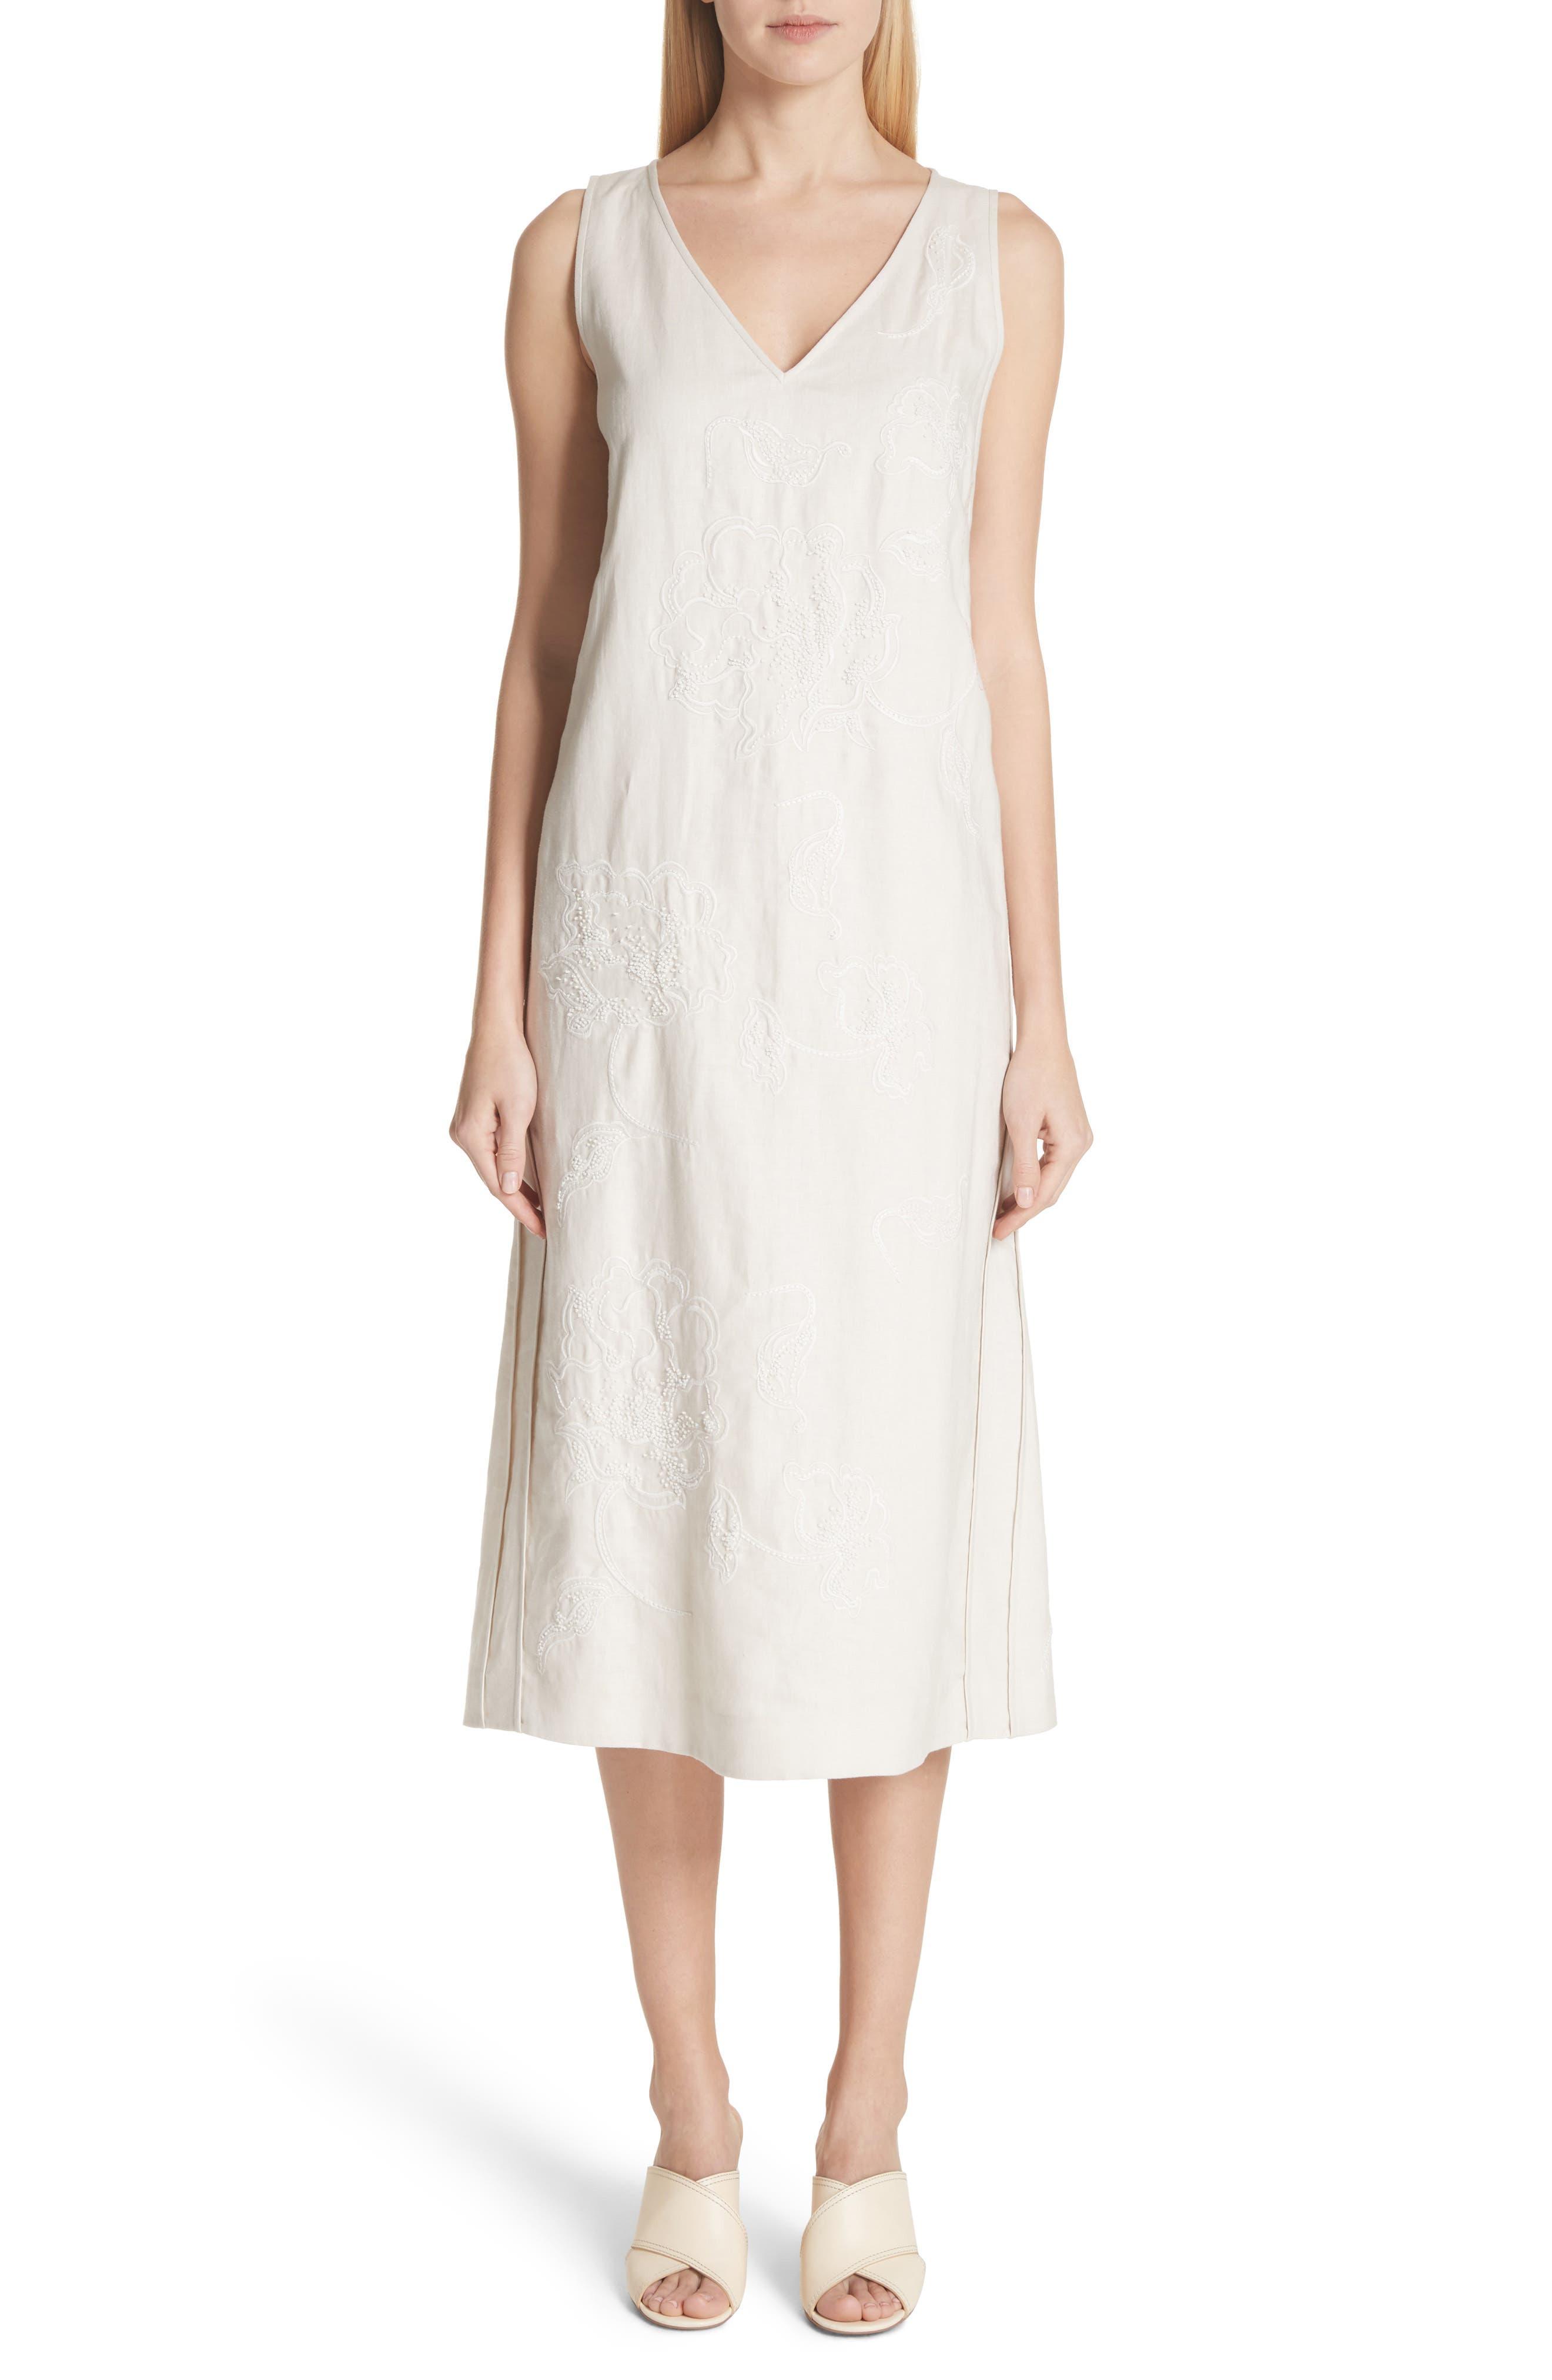 Duncan Embroidered Linen Dress,                         Main,                         color, 252